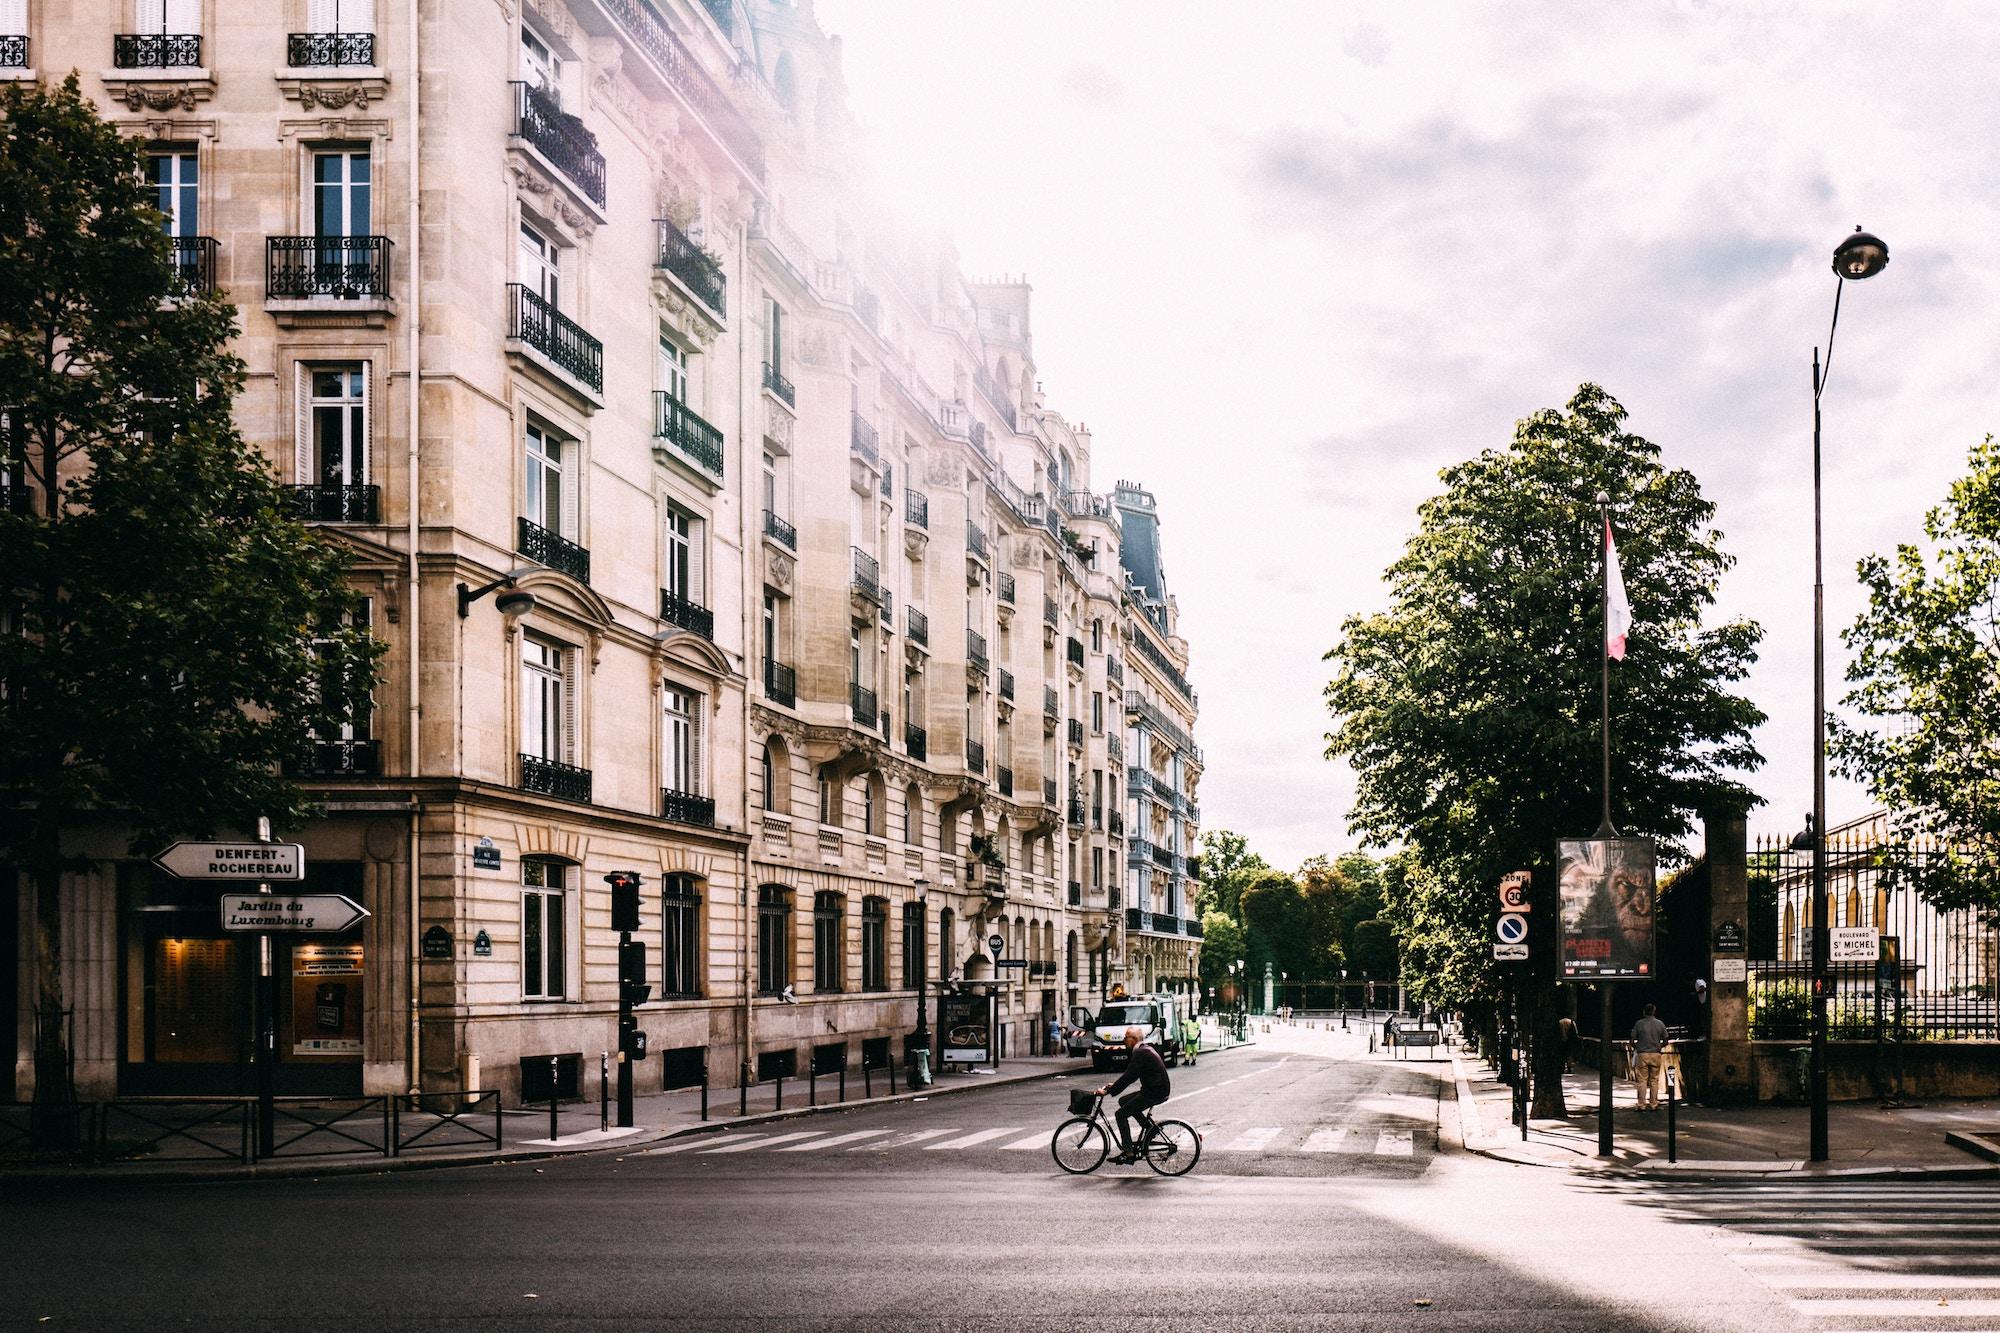 A cyclist rides across an empty street in Paris as the sun peeks from behind a classic Haussmann apartment building.